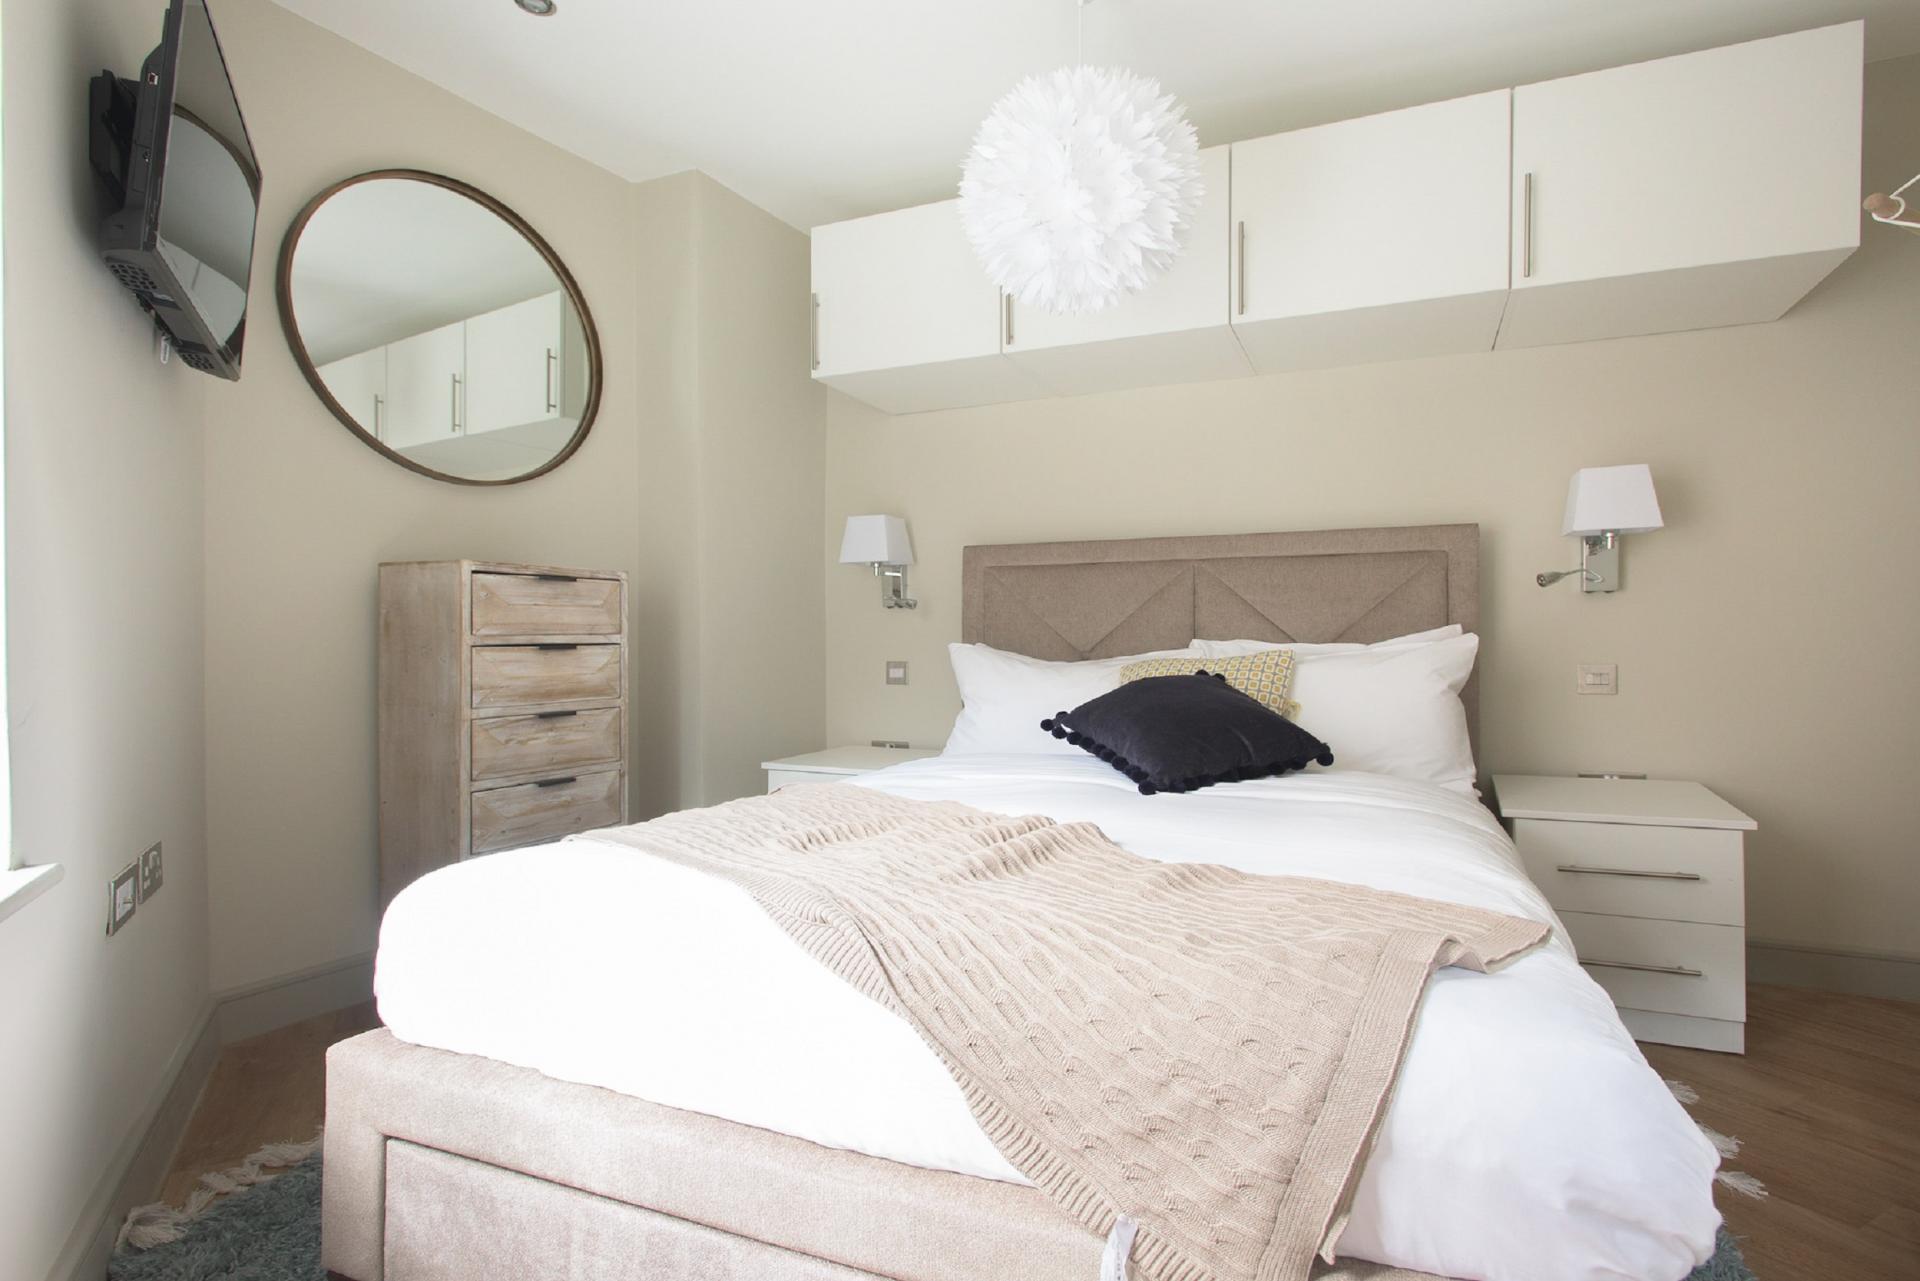 Bedroom at The New Bond Street Loft, Mayfair, London